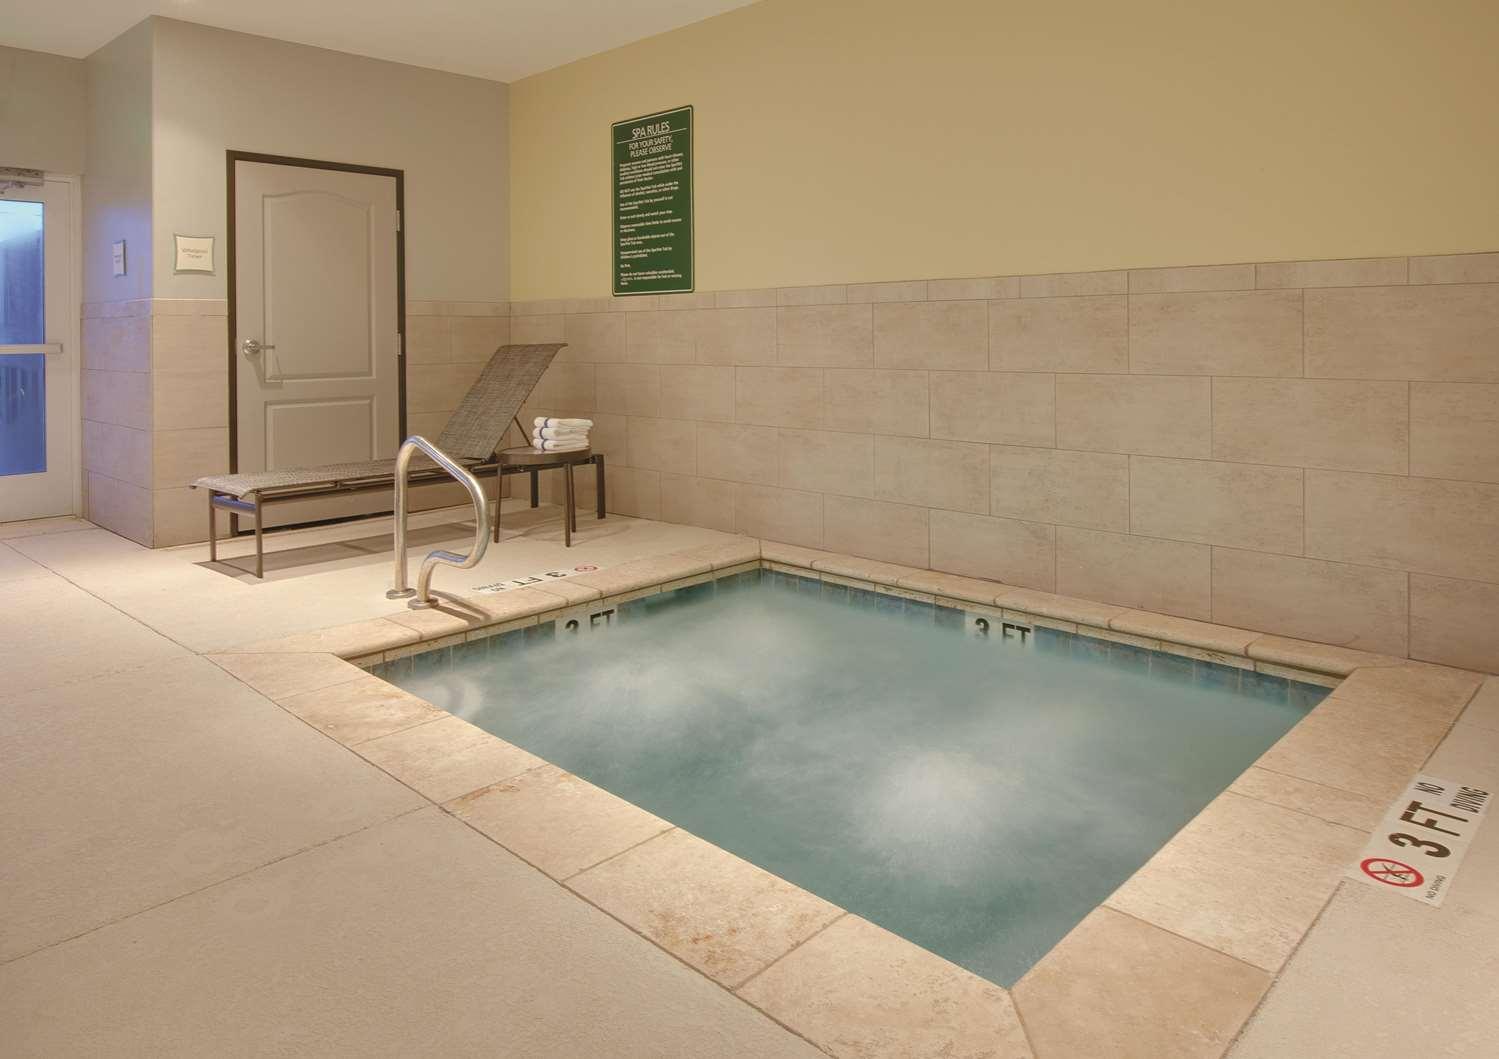 Pool - La Quinta Inn & Suites Andrews